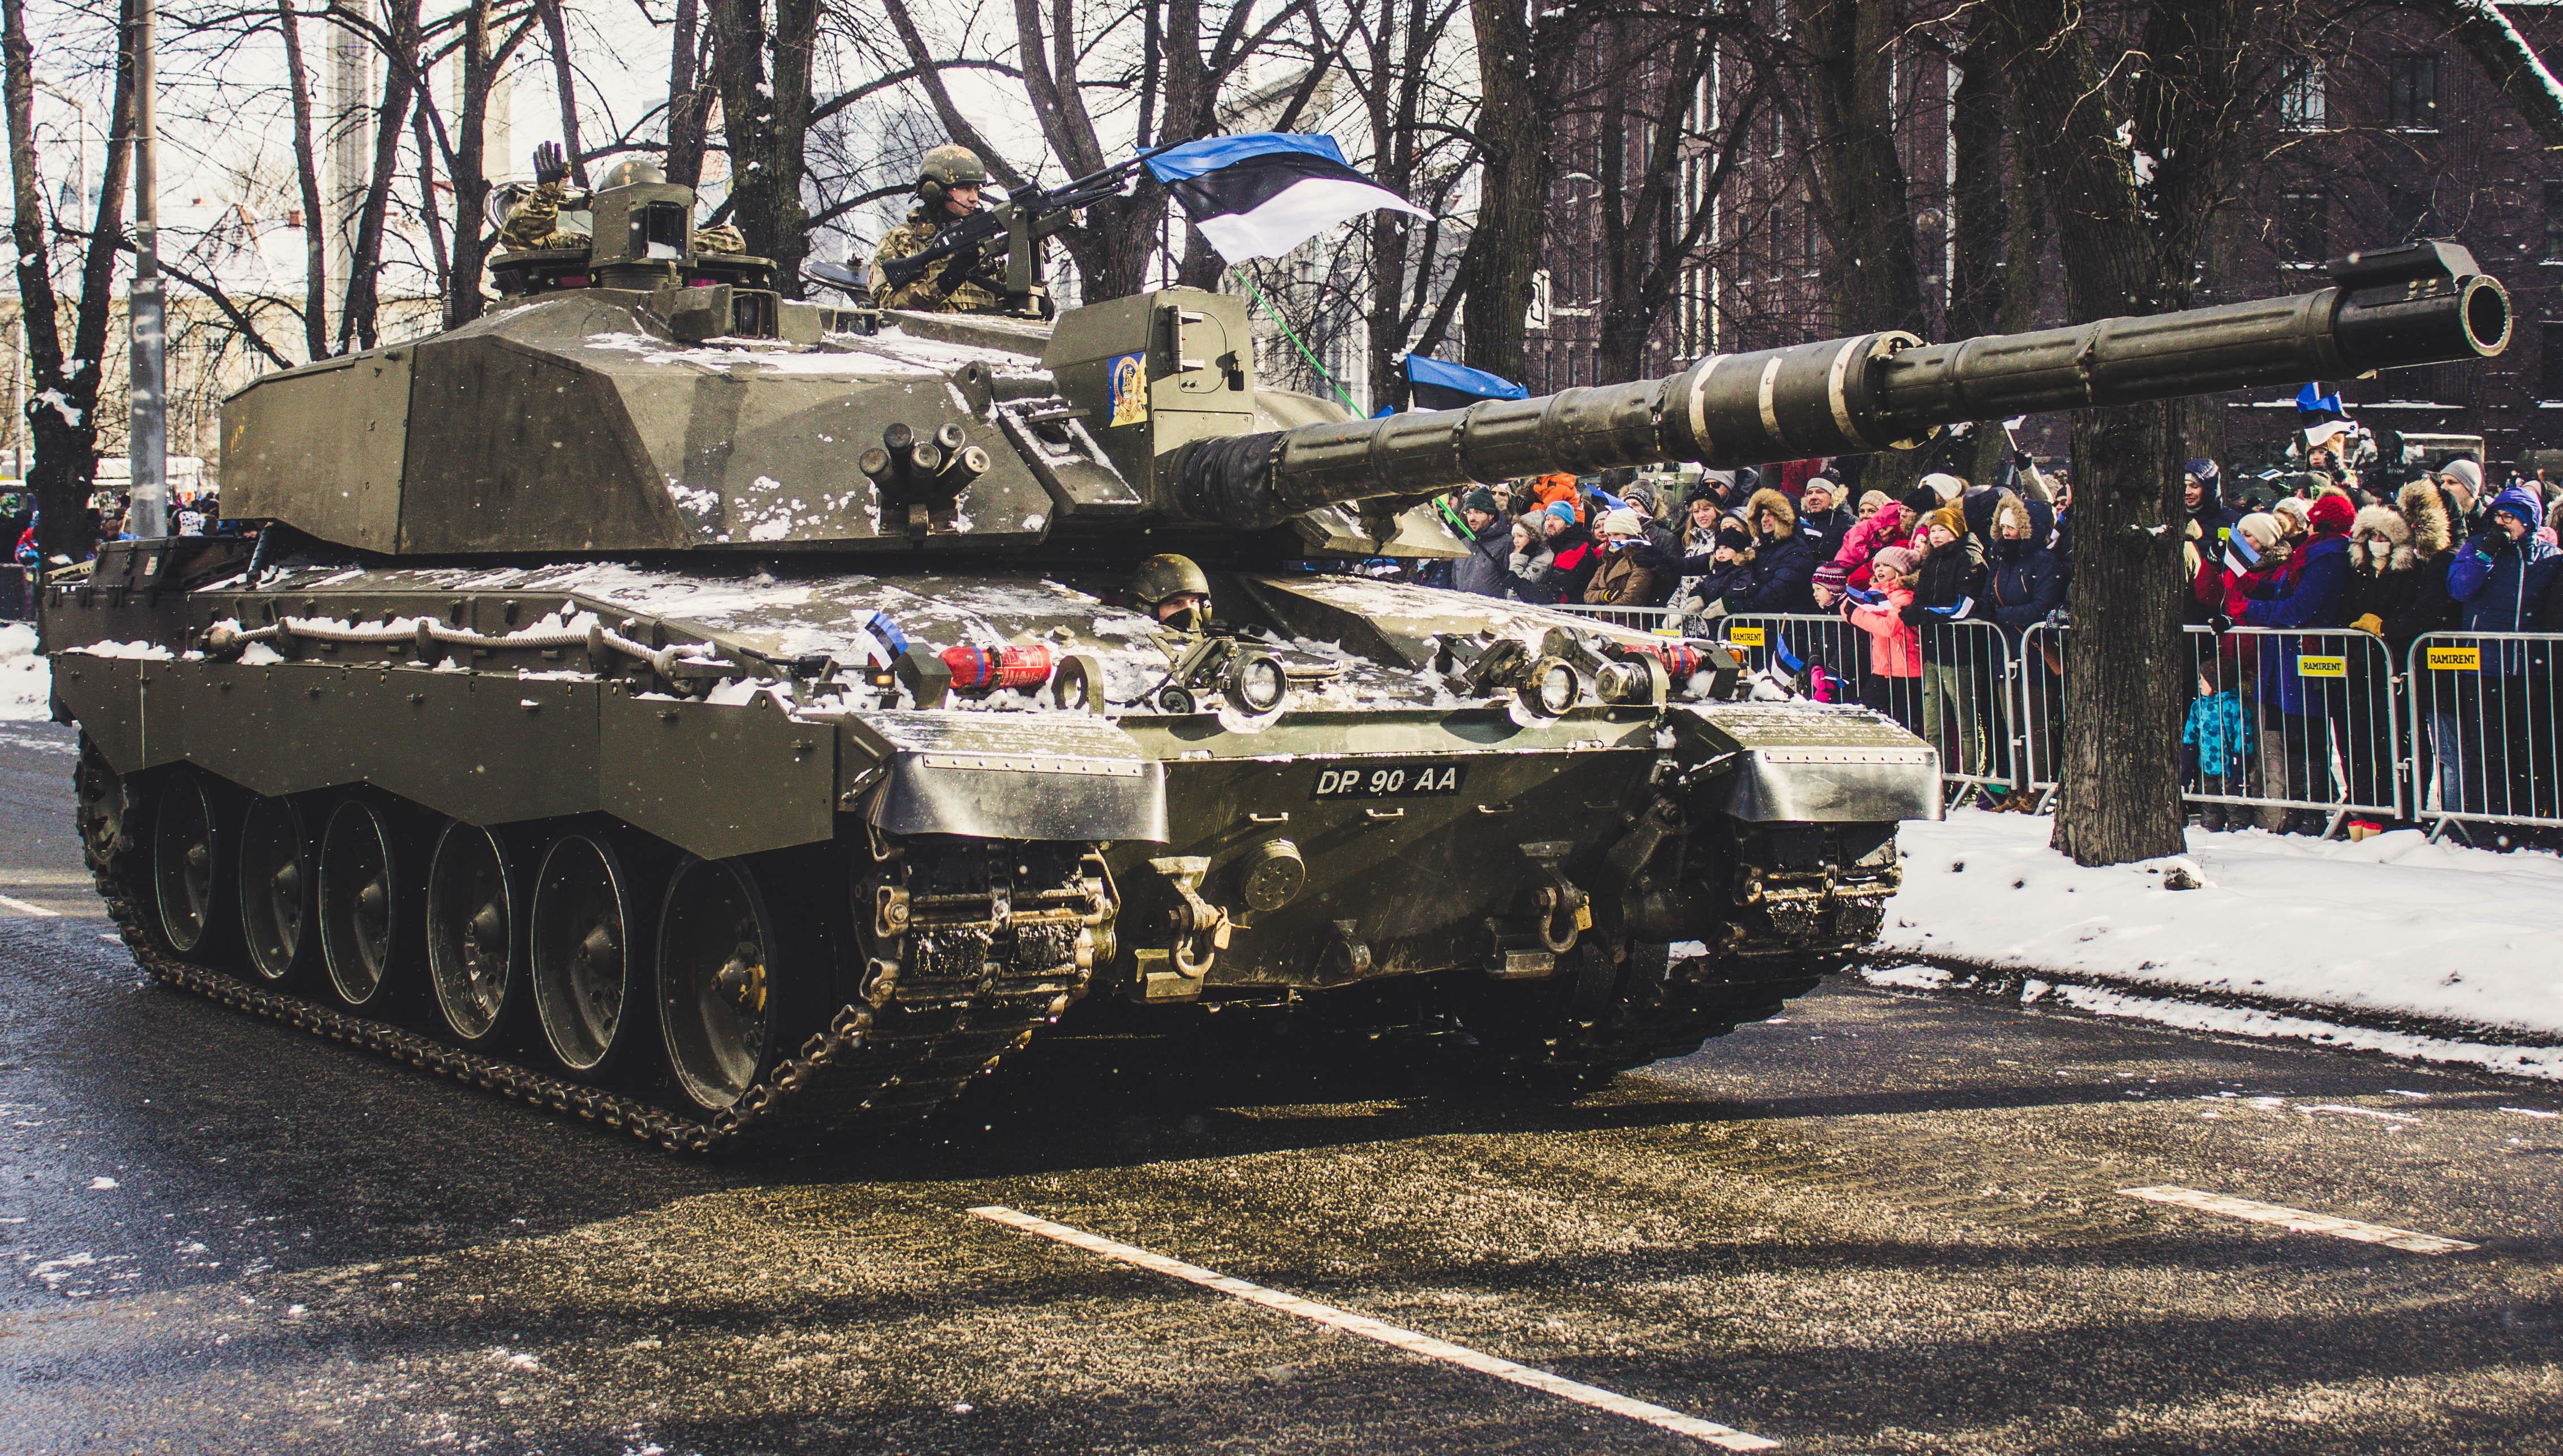 Soldier Tank on Road, People, Winter, Wear, Weapons, HQ Photo